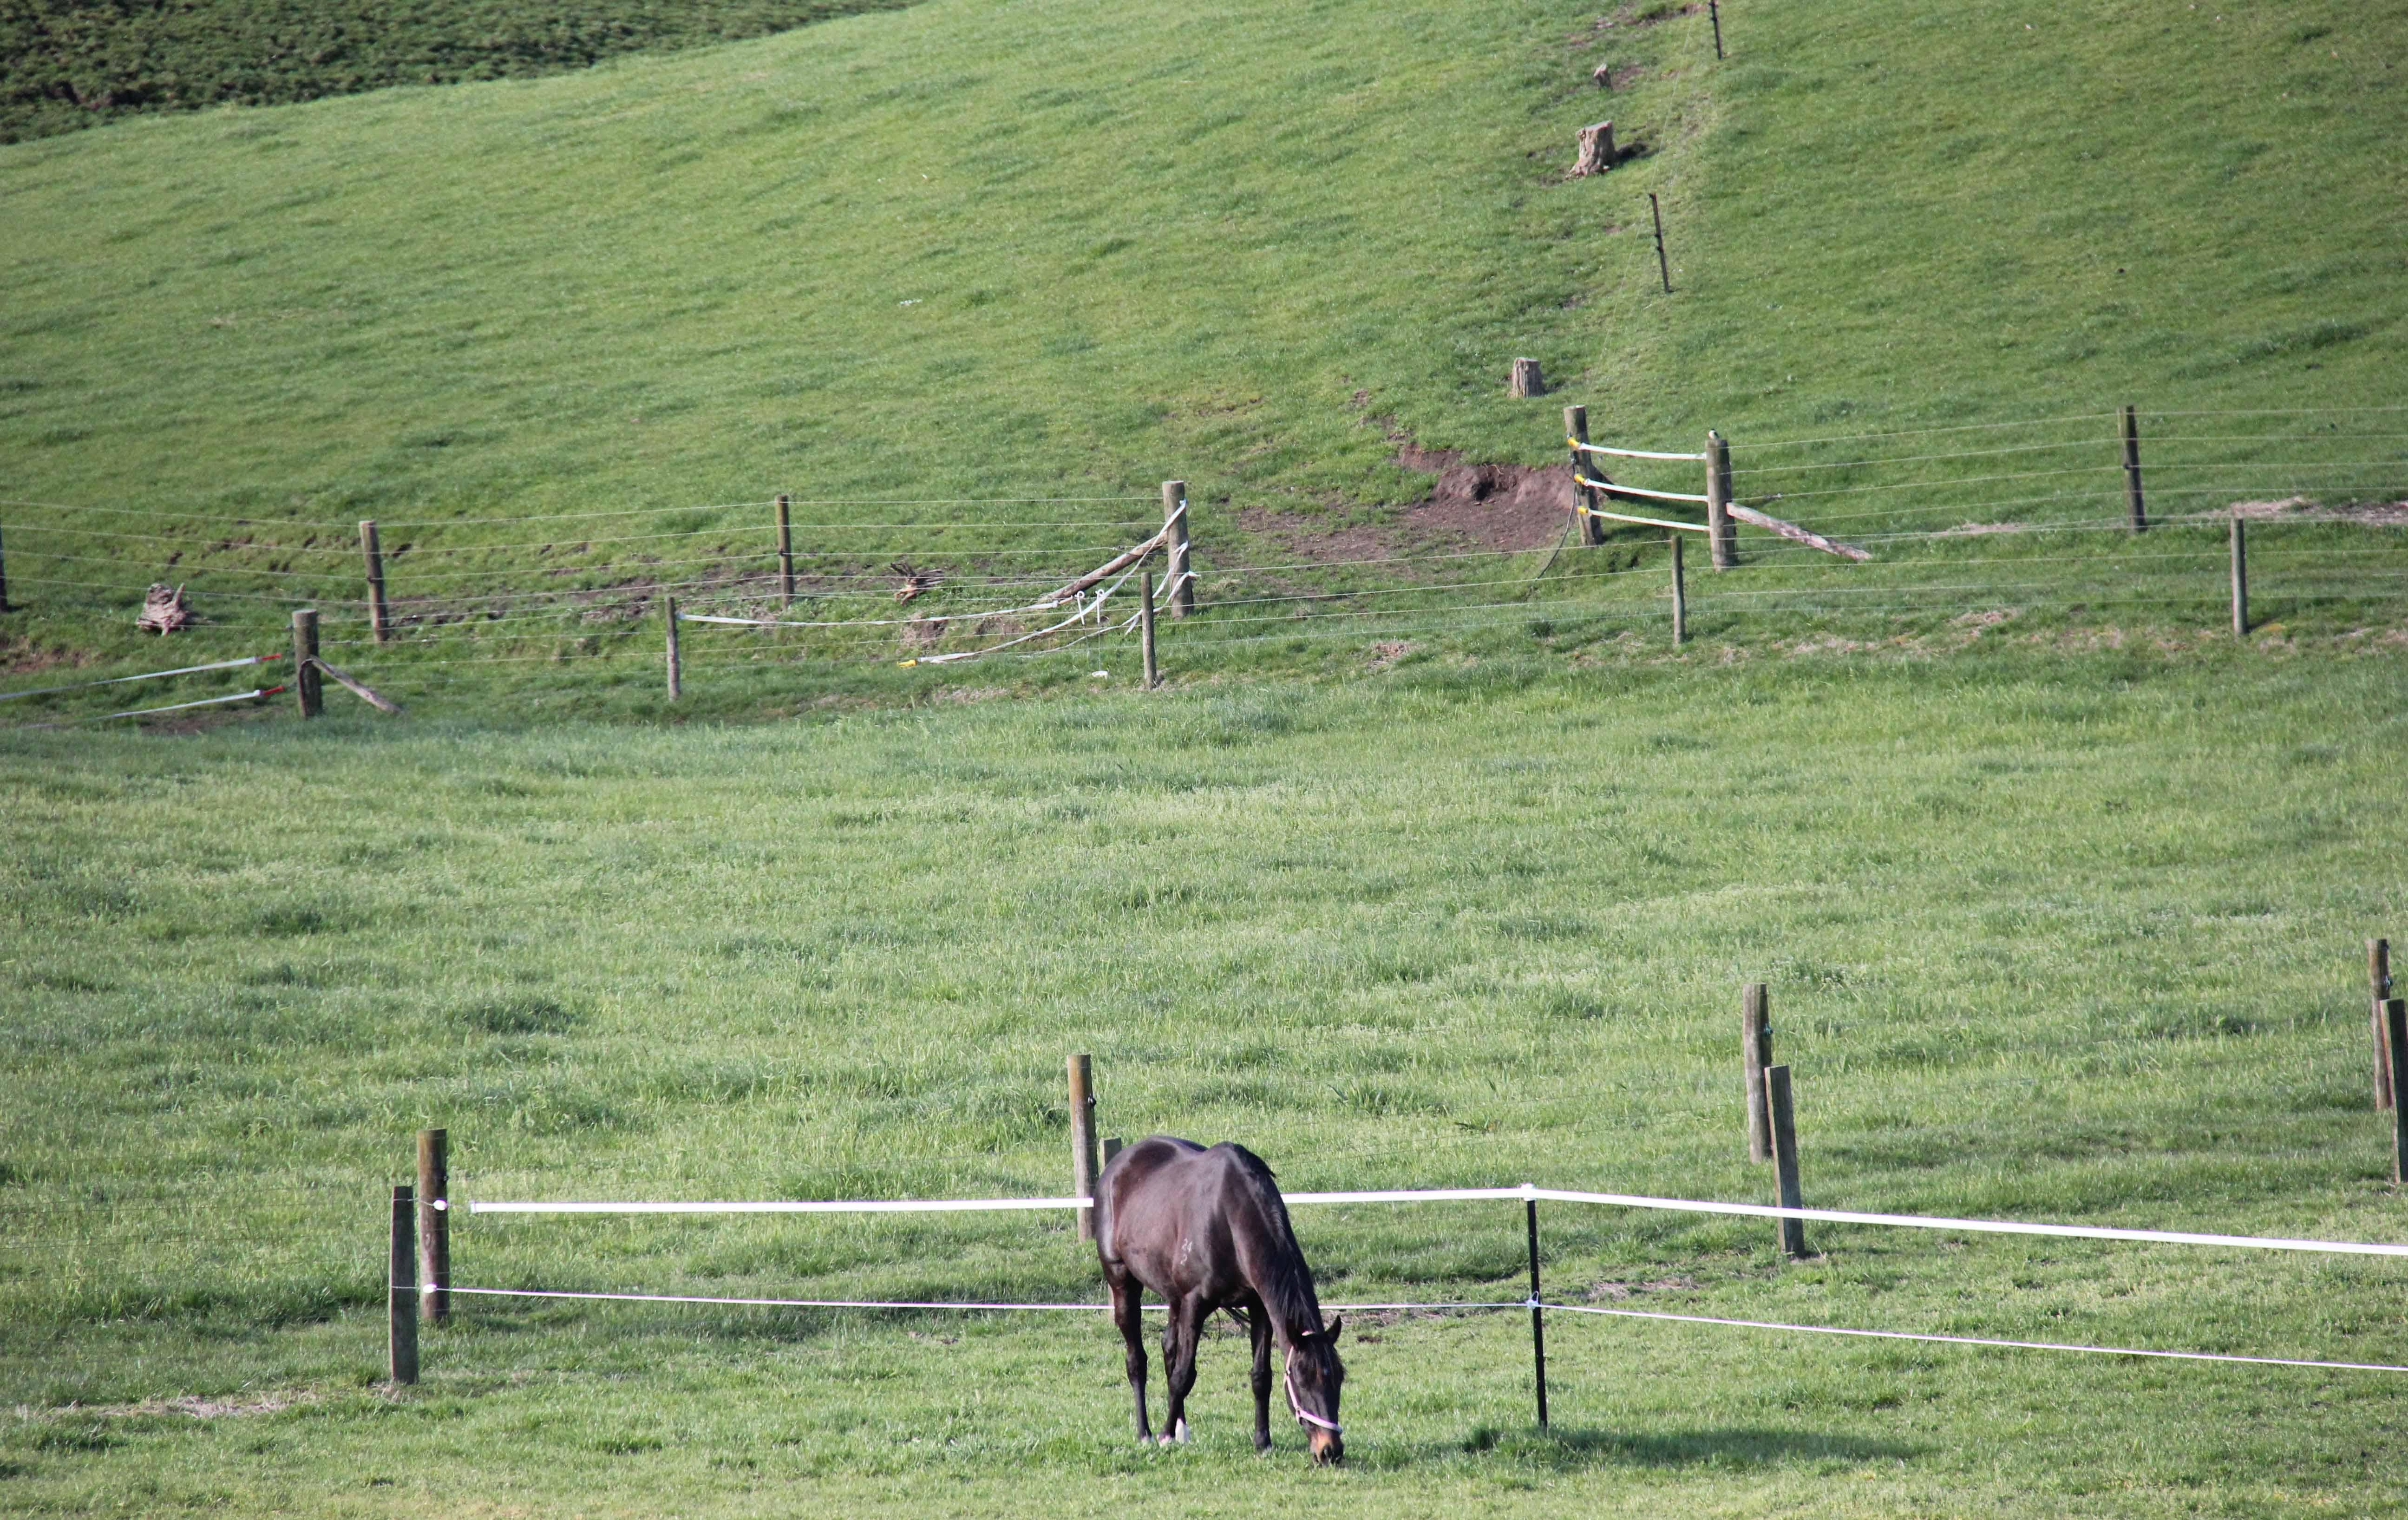 Safe Equi-fenced pasture.